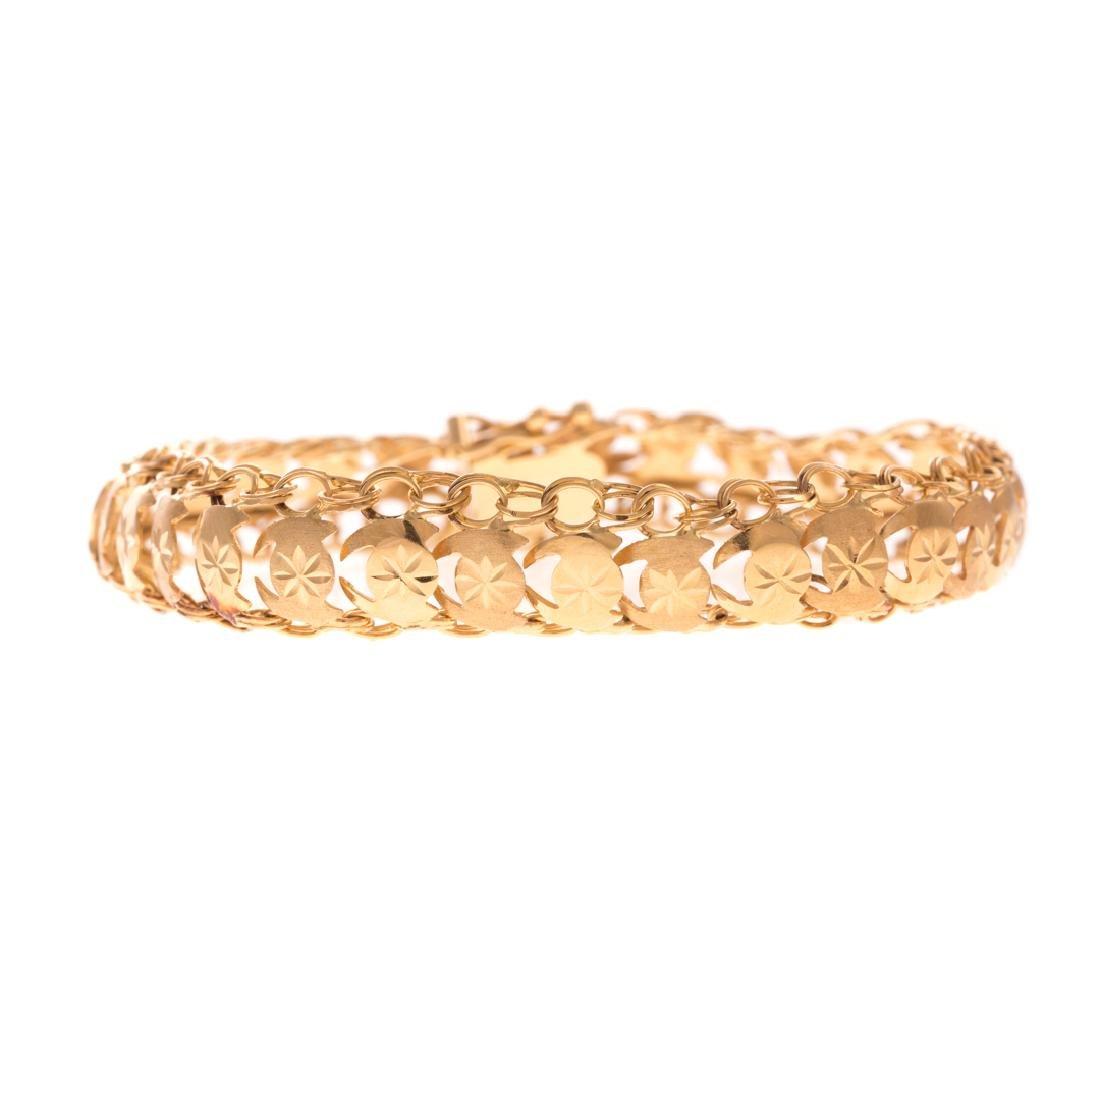 A Lady's Woven Bracelet in 18K Yellow Gold